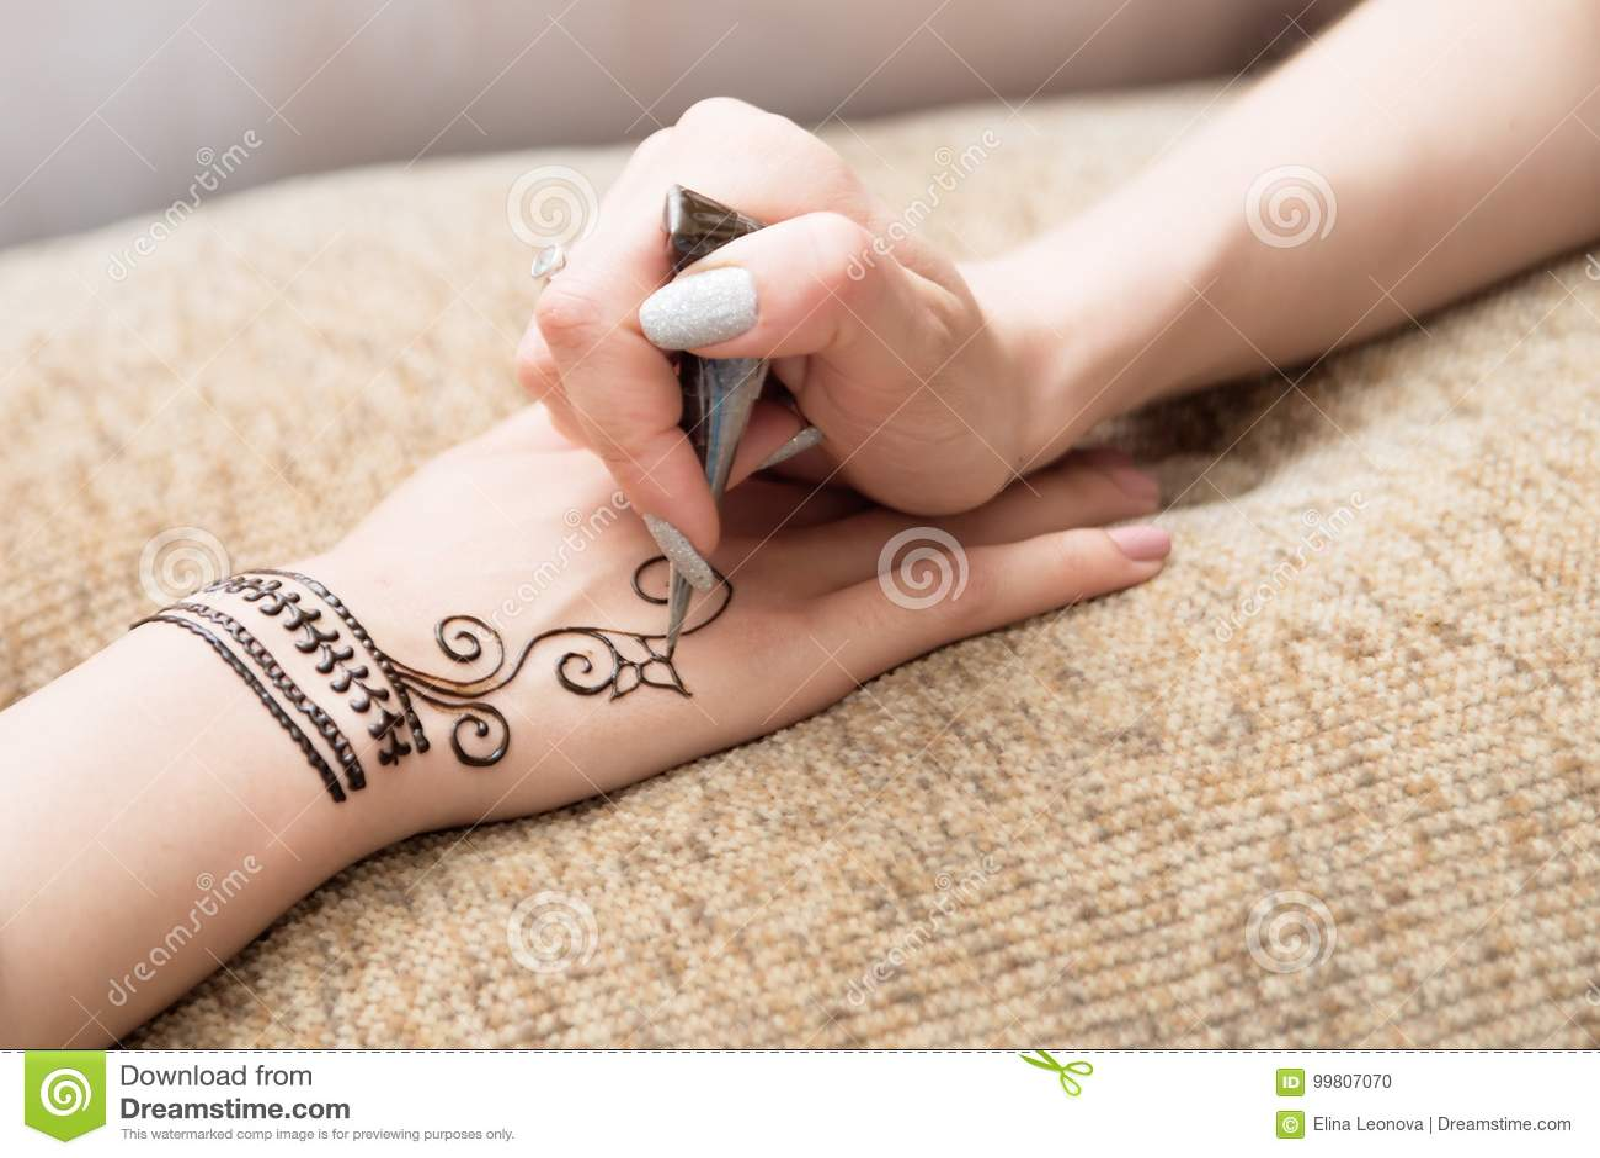 Henna Mehendi A Mano Dibujo Ilustraciones Asiático Foto De